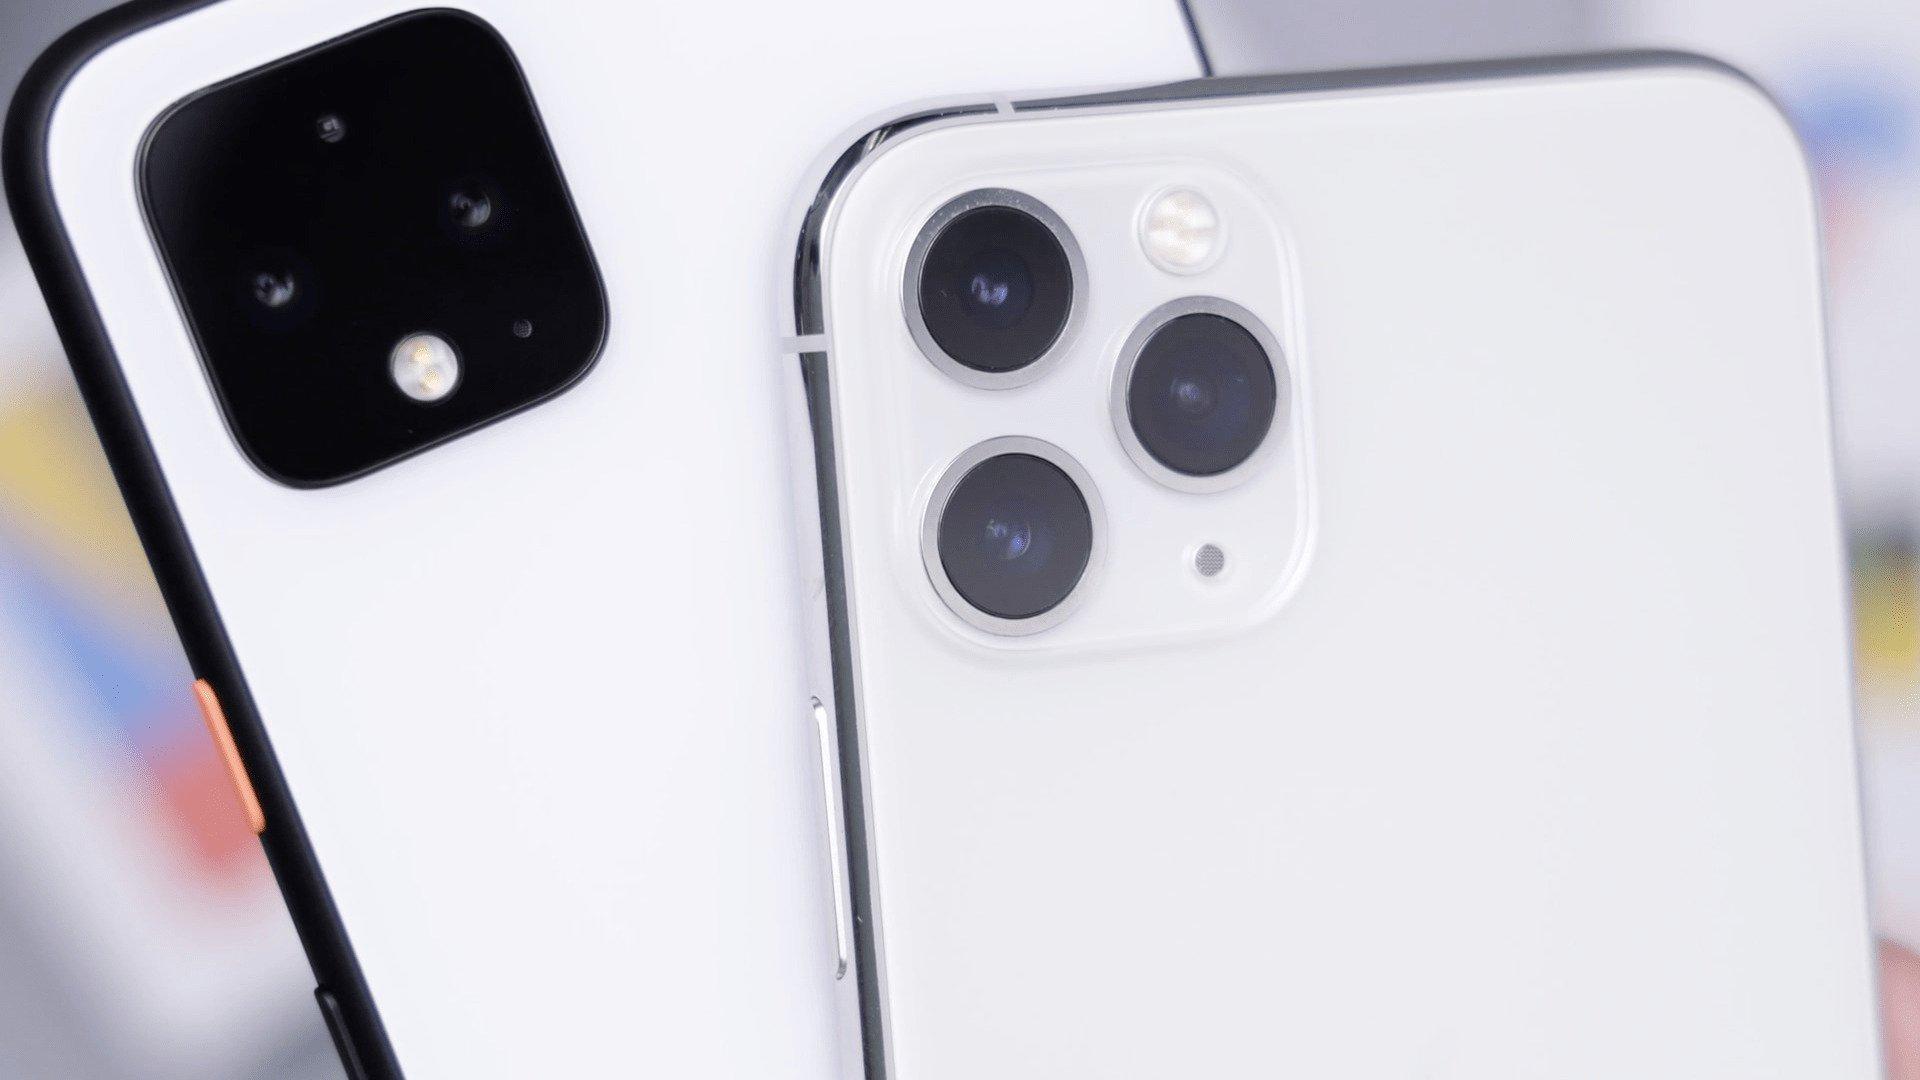 White Pixel4XL & Silver iPhone 11 Pro / Photo by Daniel Romero on Unsplash